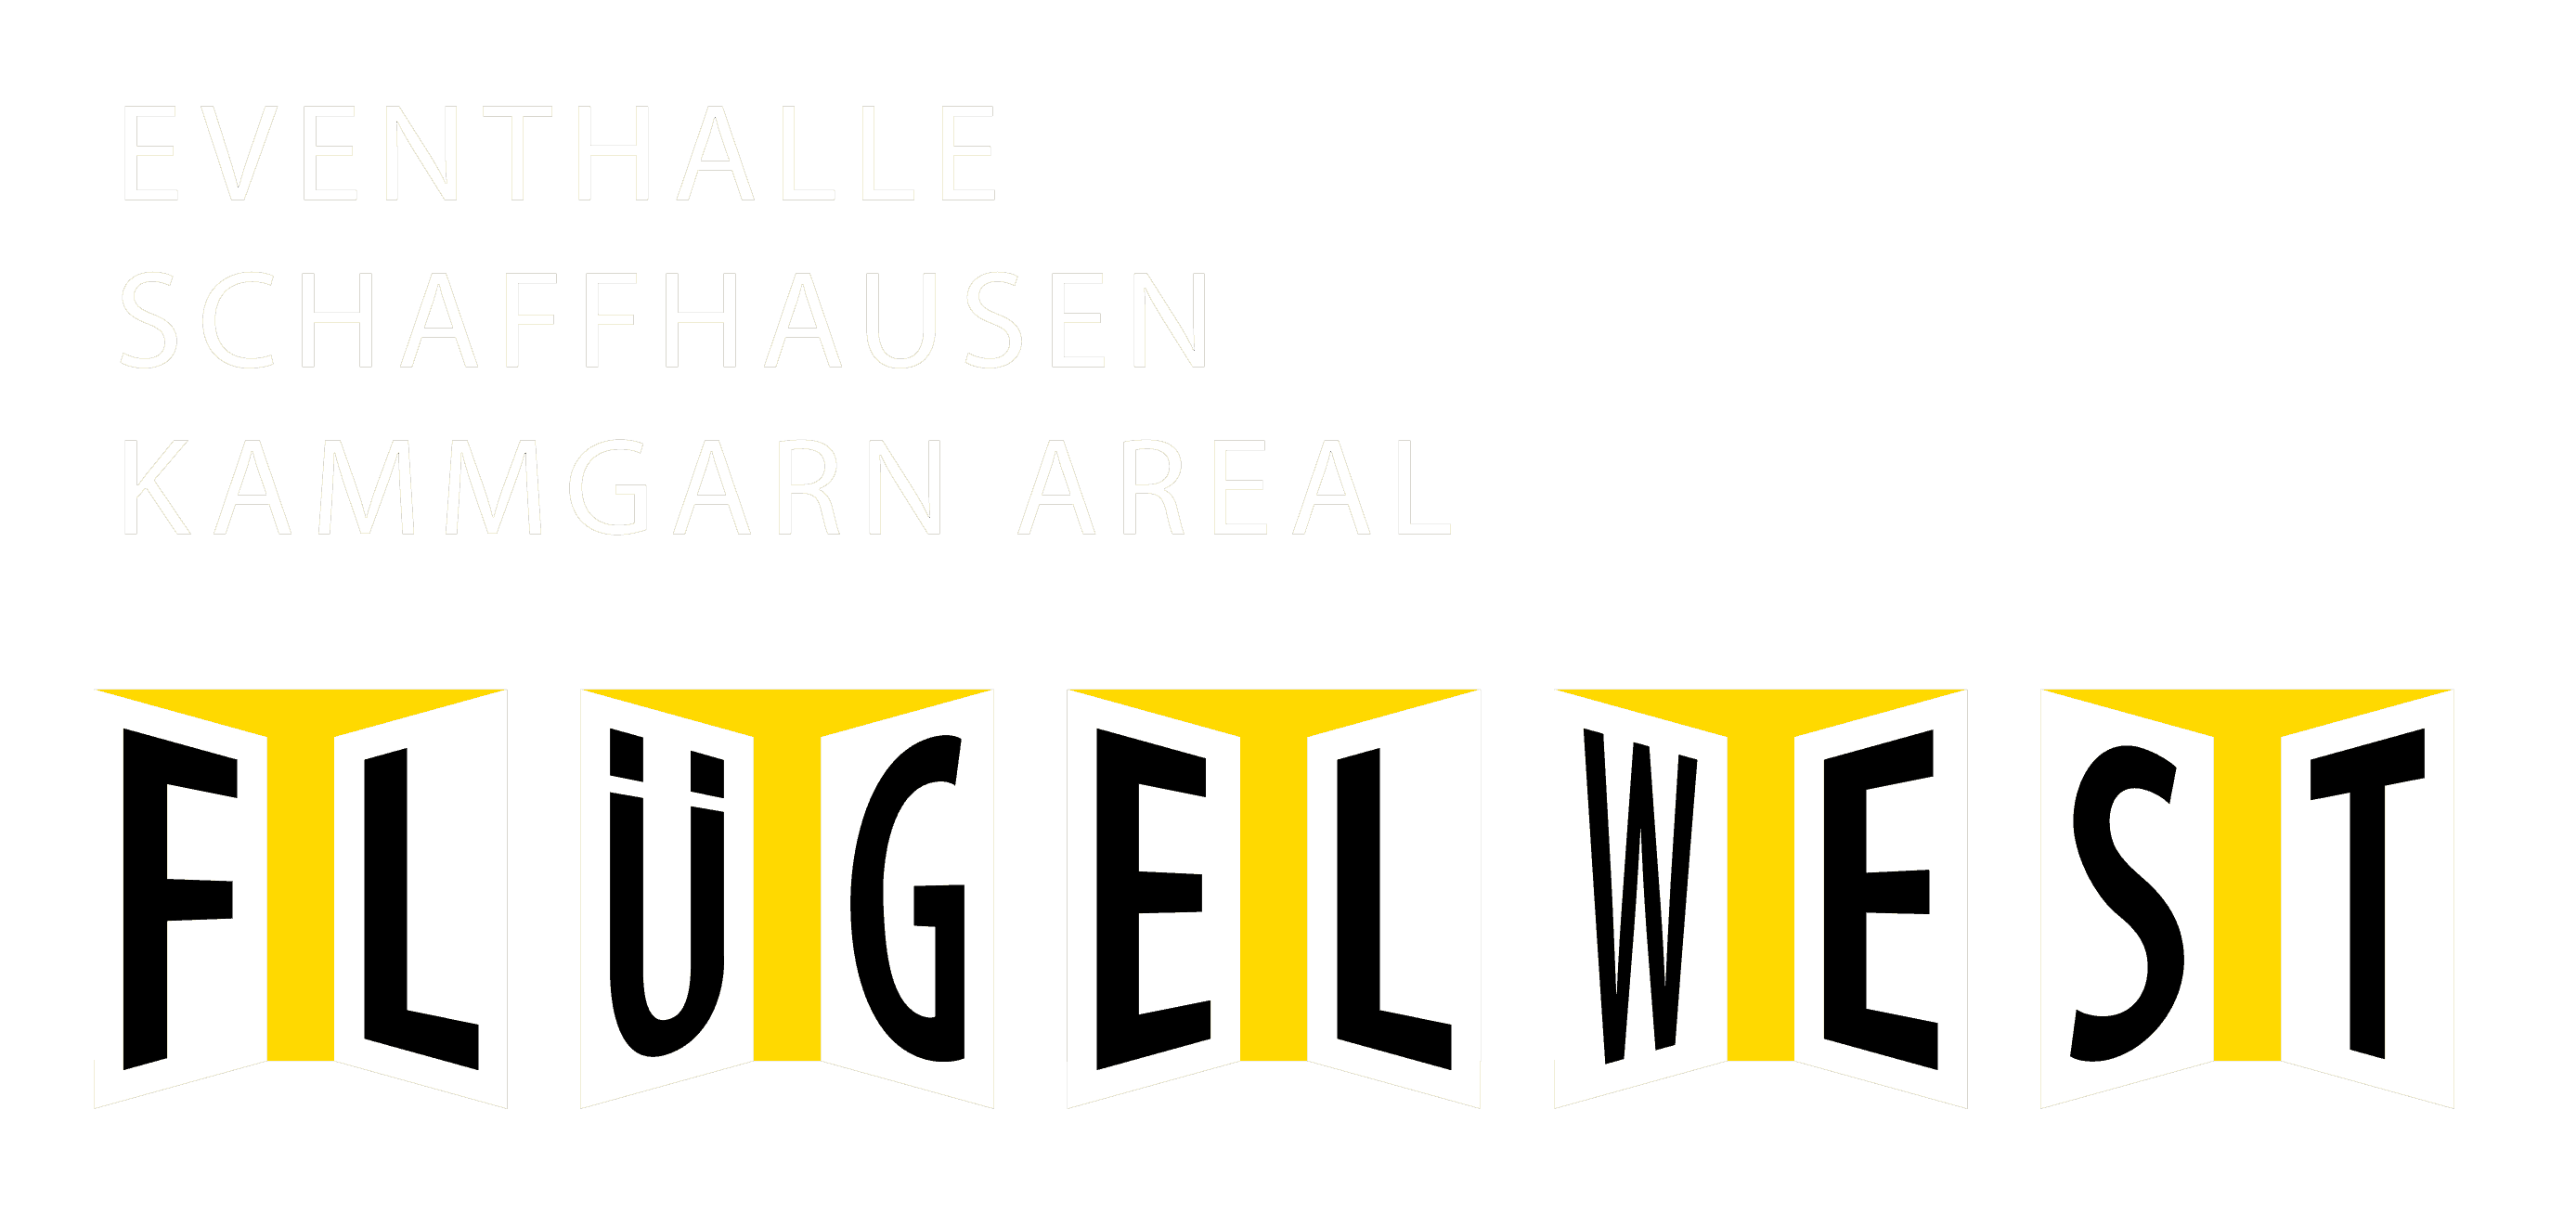 Flügelwest